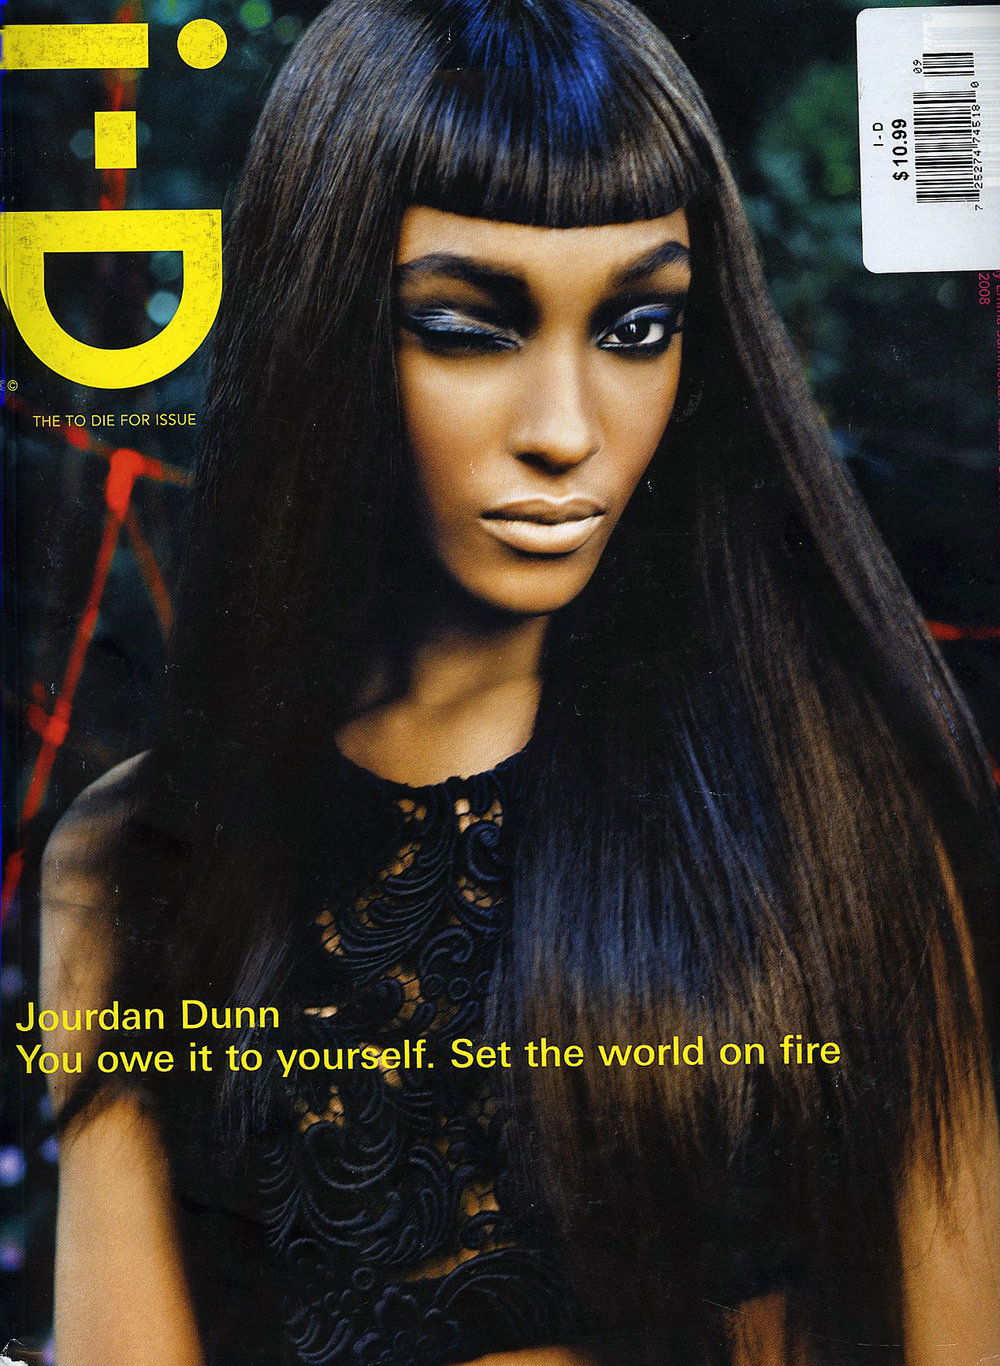 I-D magazineCover.jpg